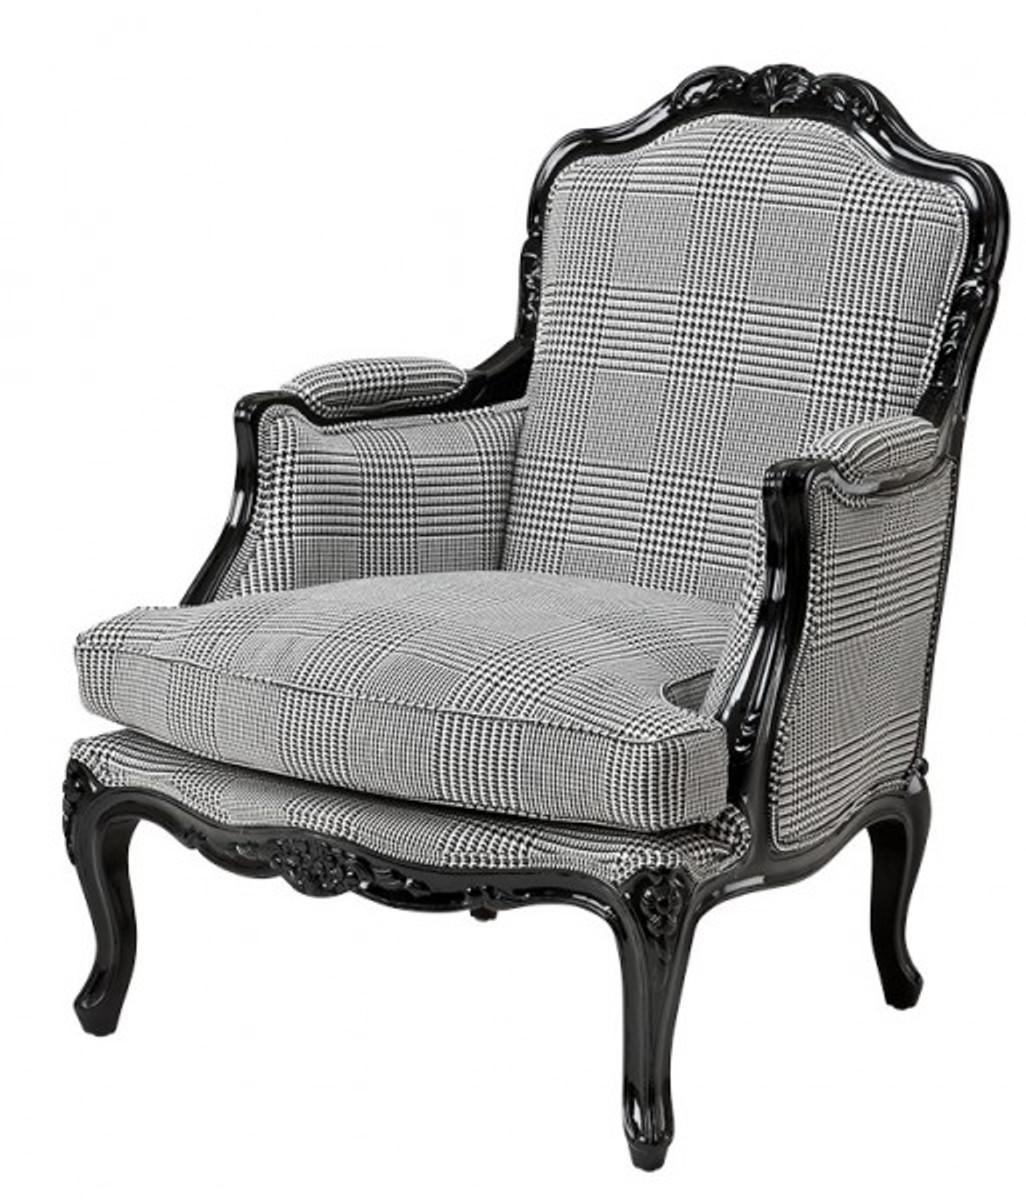 casa padrino luxus barock lounge sessel schwarz grau kariert hotel m bel dekoration sessel. Black Bedroom Furniture Sets. Home Design Ideas